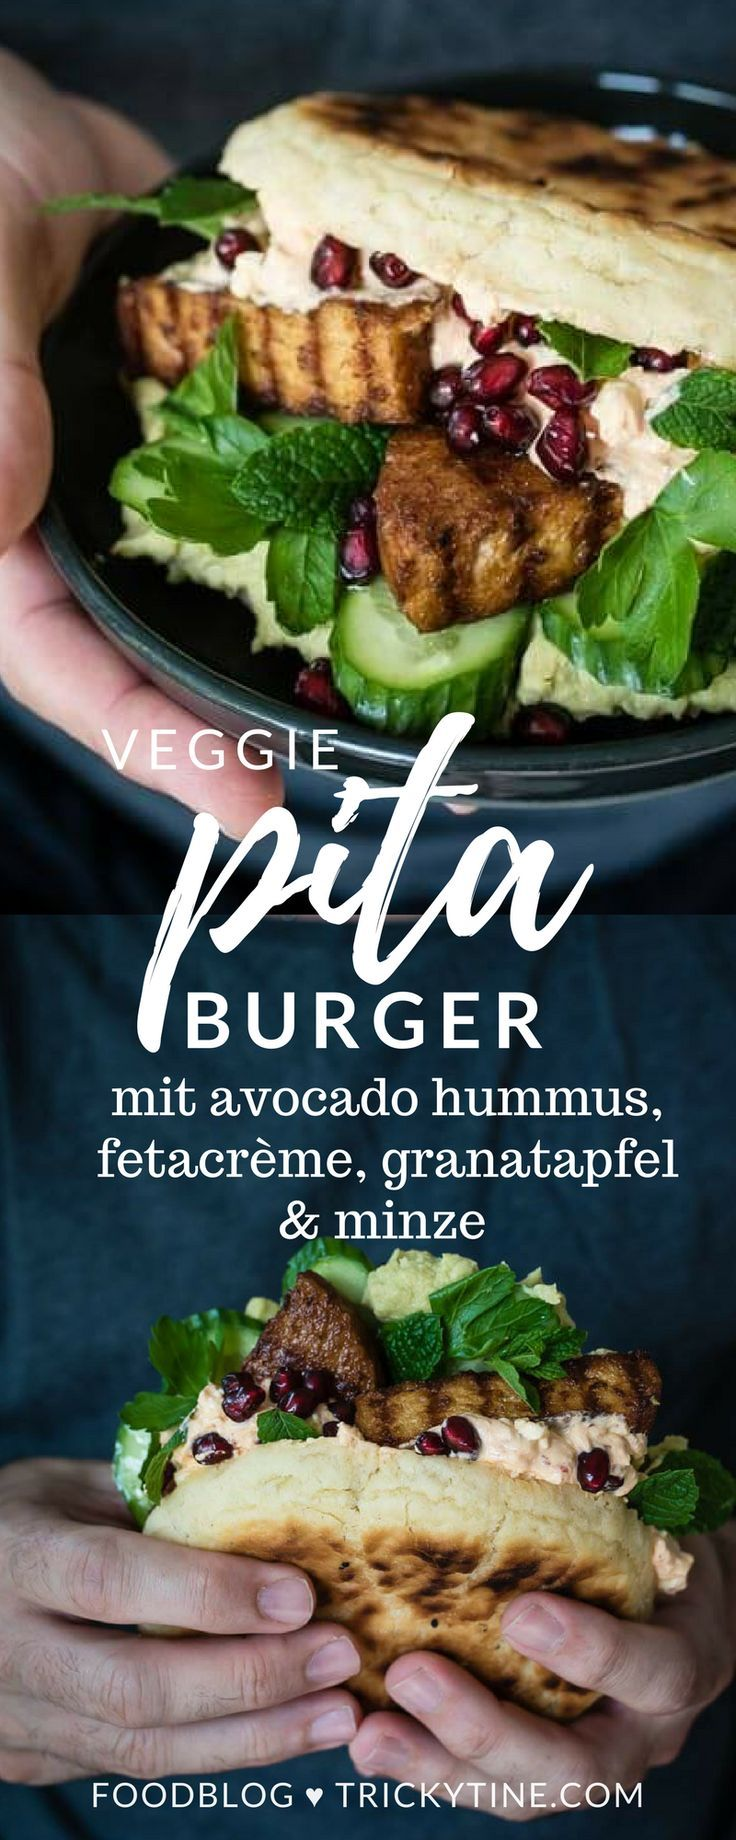 veggie pitta burger mit avocado hummus, fetacrème, granatapfel & minze ♥